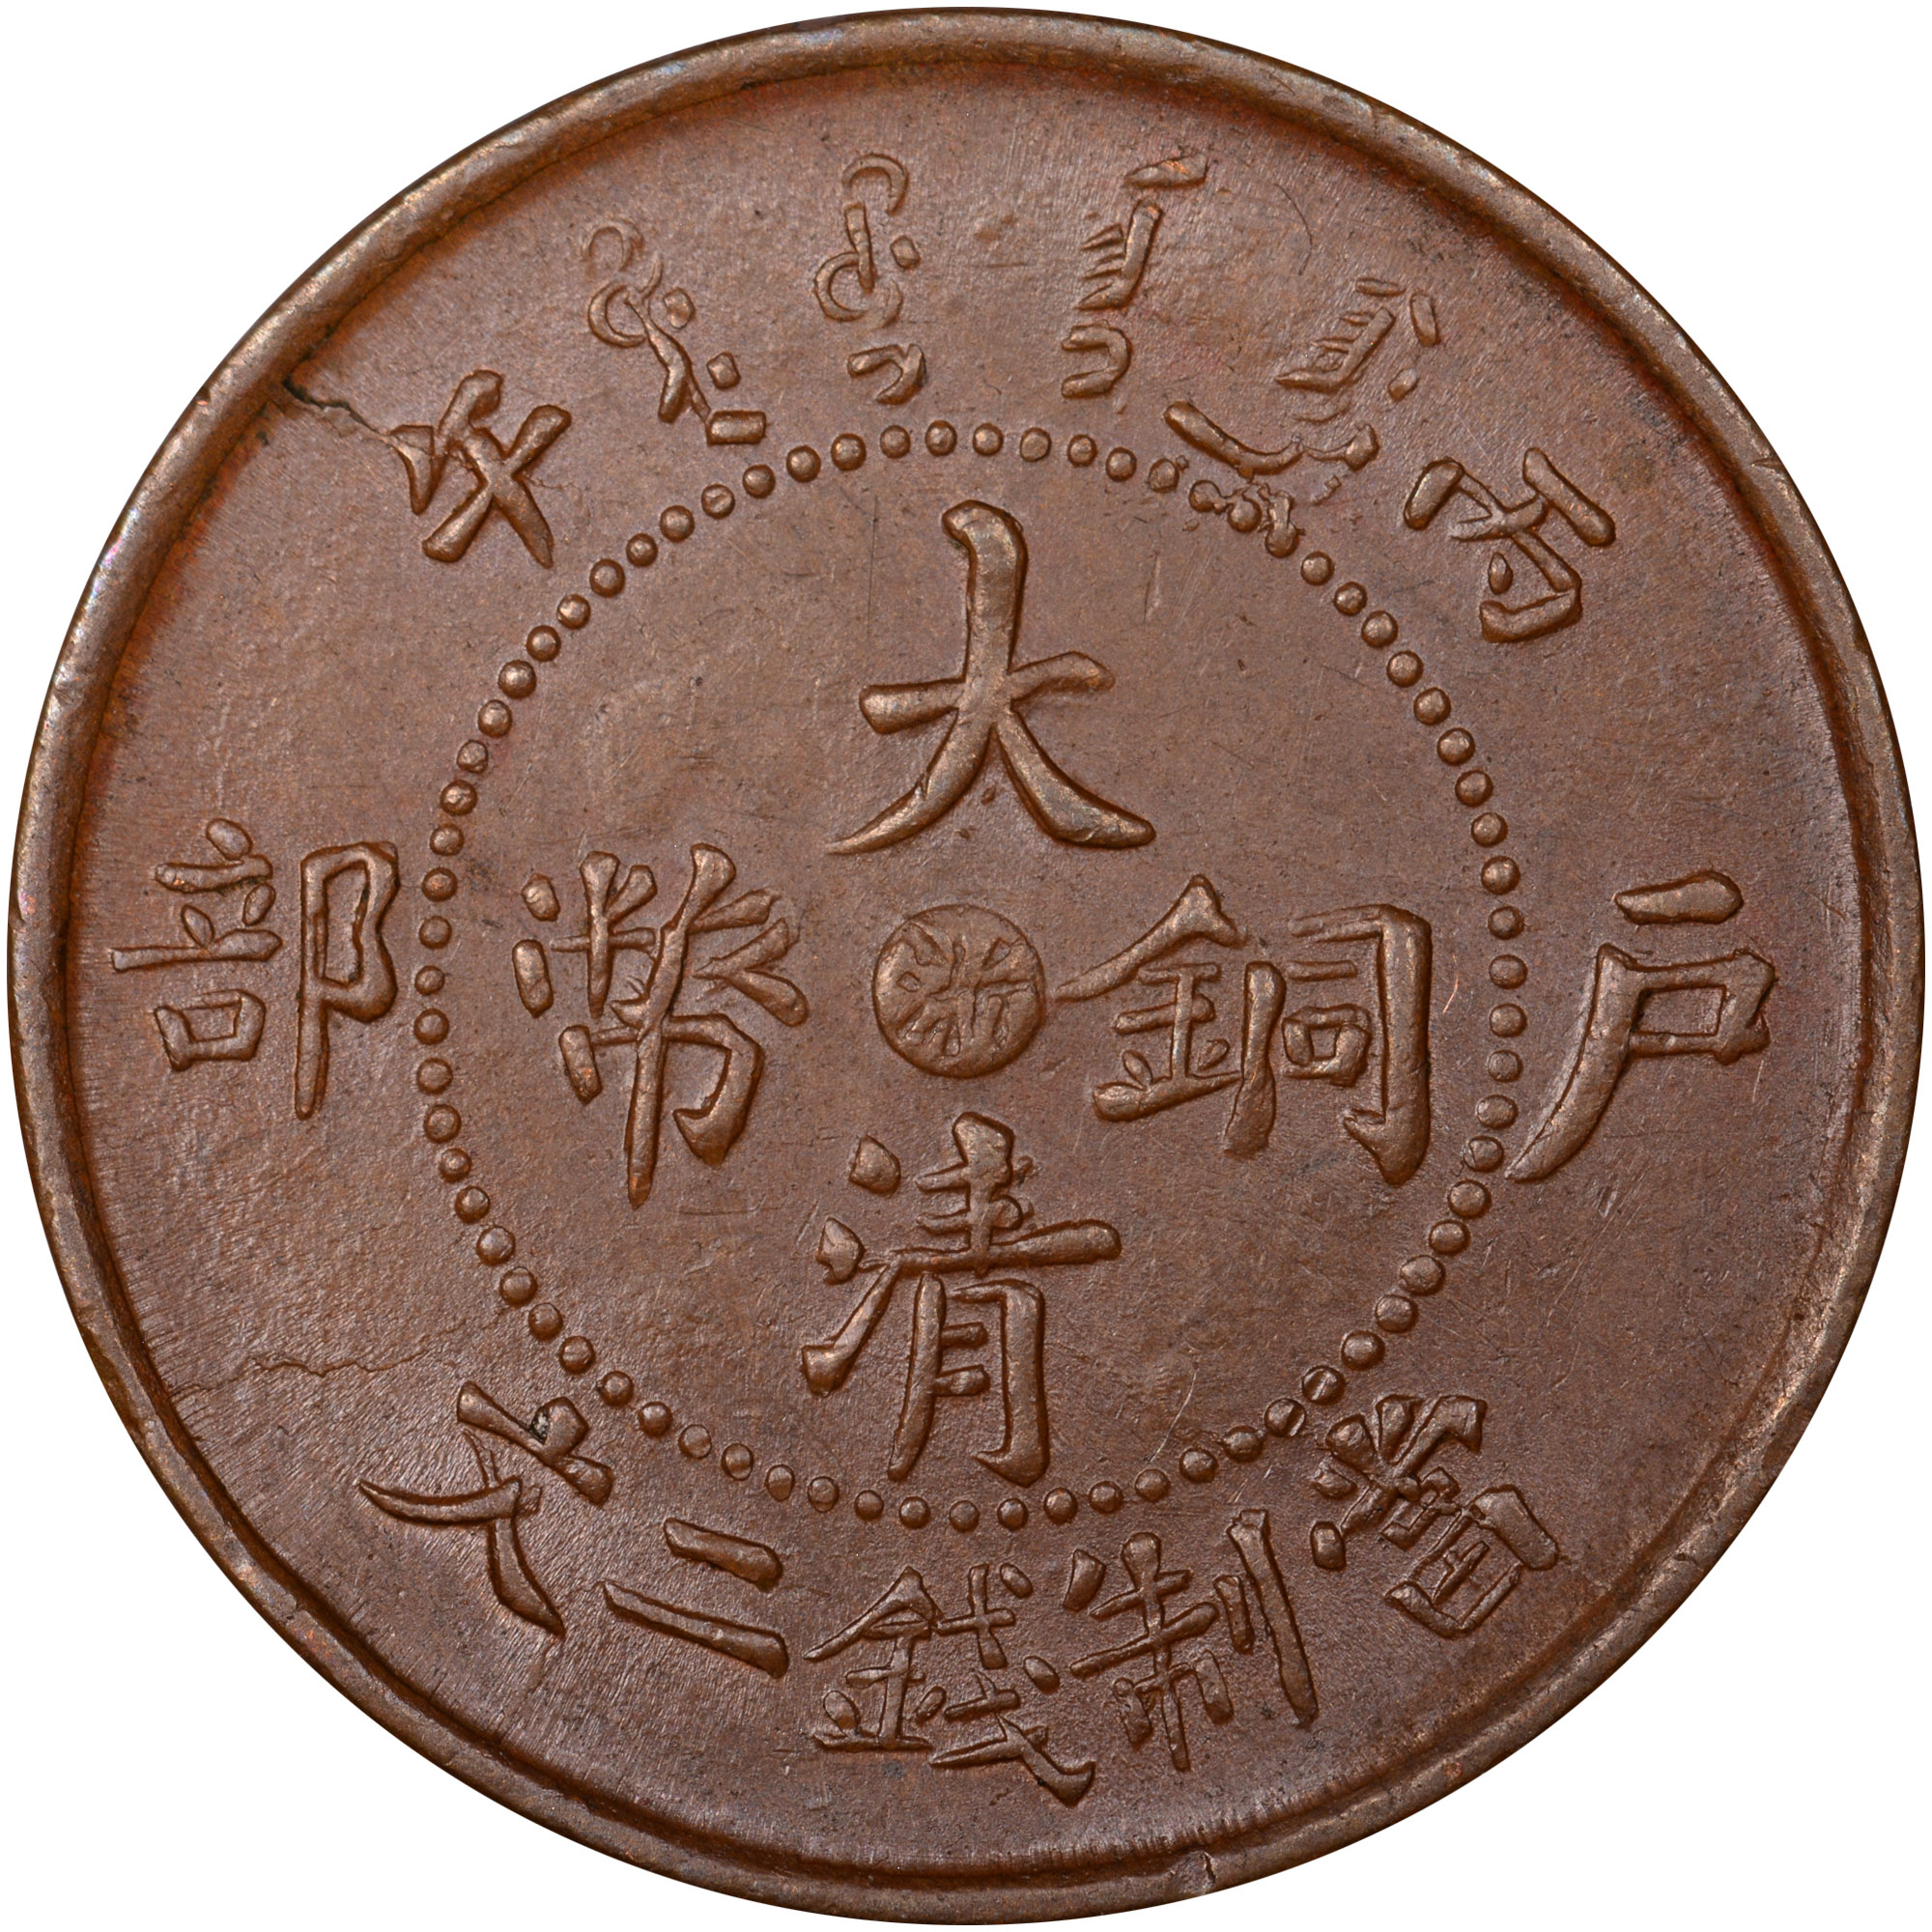 1906 China CHEKIANG PROVINCE 2 Cash obverse